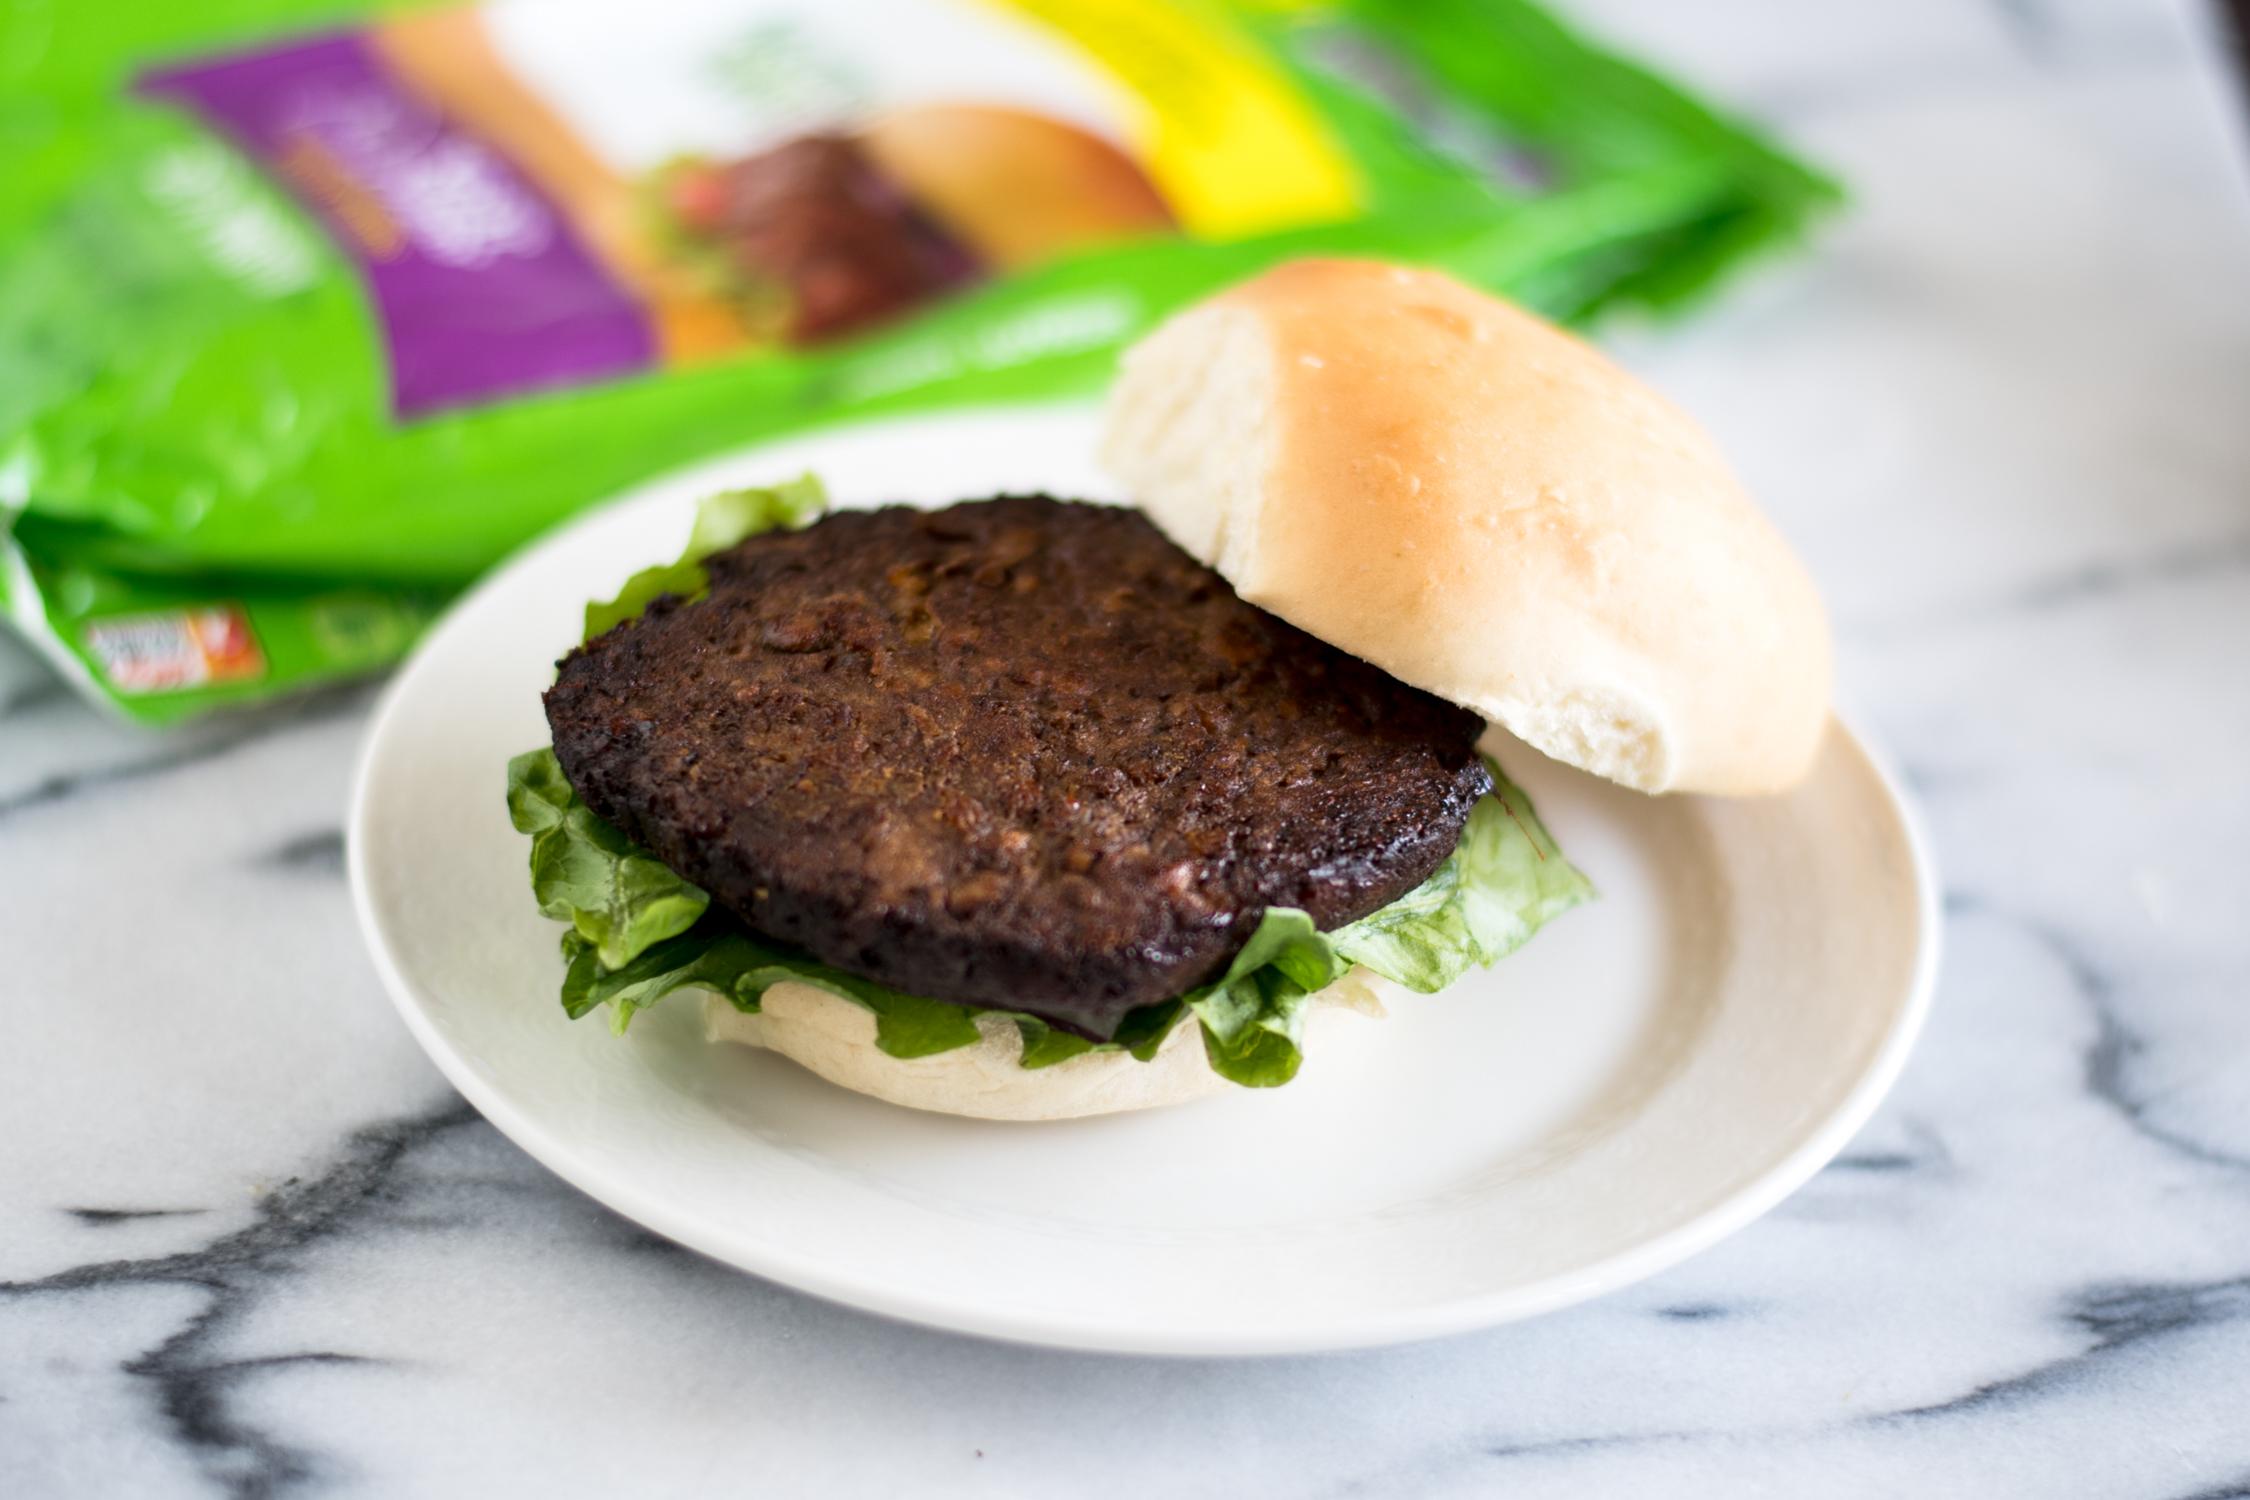 Easy Summer Vegan Burgers are perfect for Summer BBQs! #vegan #summer #BBQ #burger